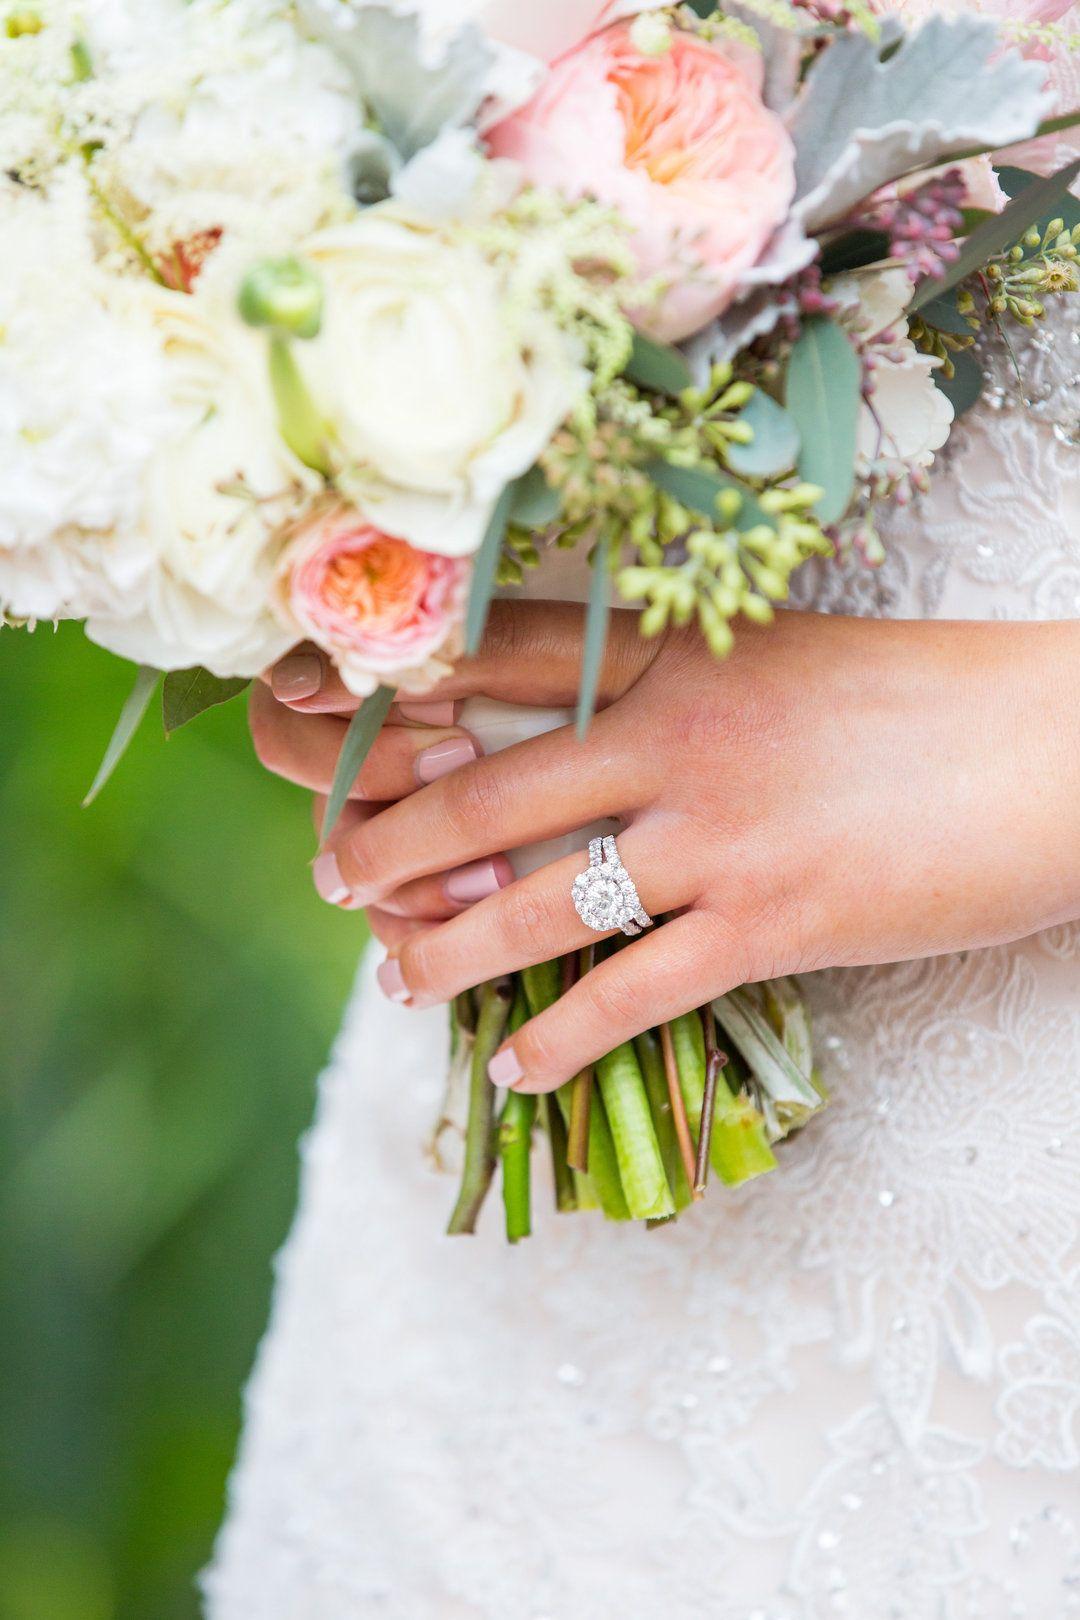 Pin By Jenn Wagner Studio On Wedding Flowers Fun Engagement Wedding Flowers Wedding Day